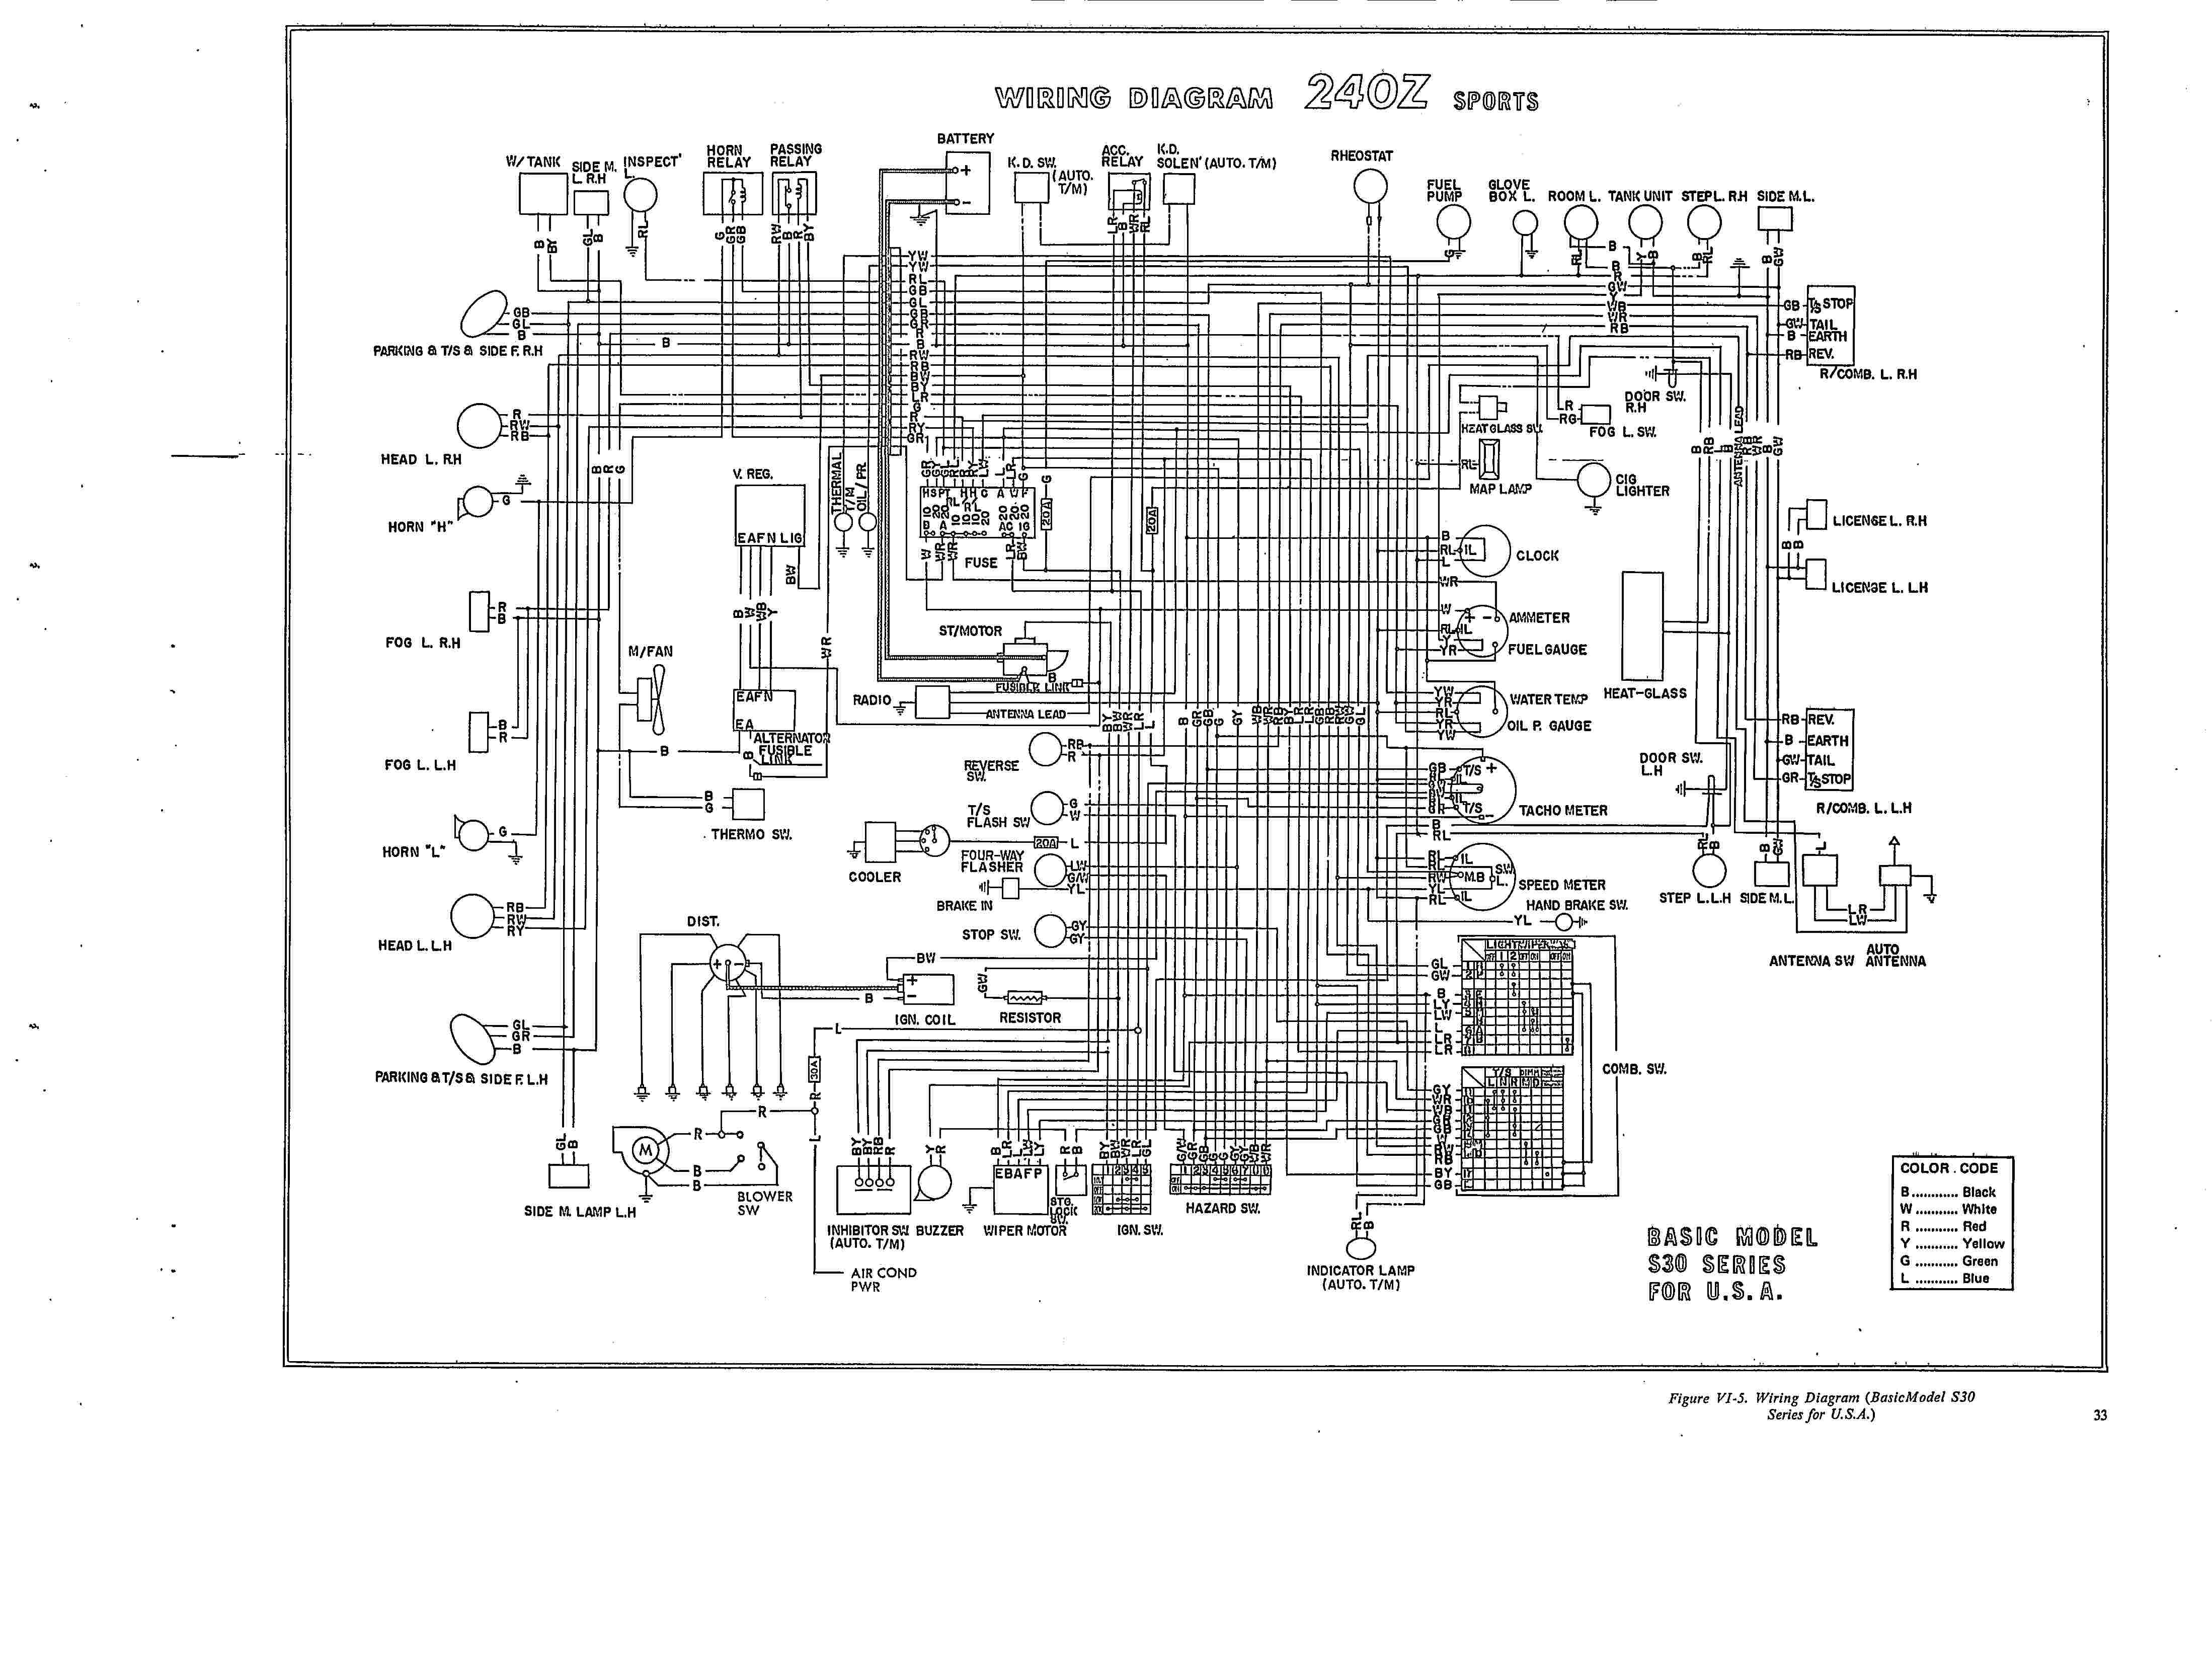 castle link wiring diagram